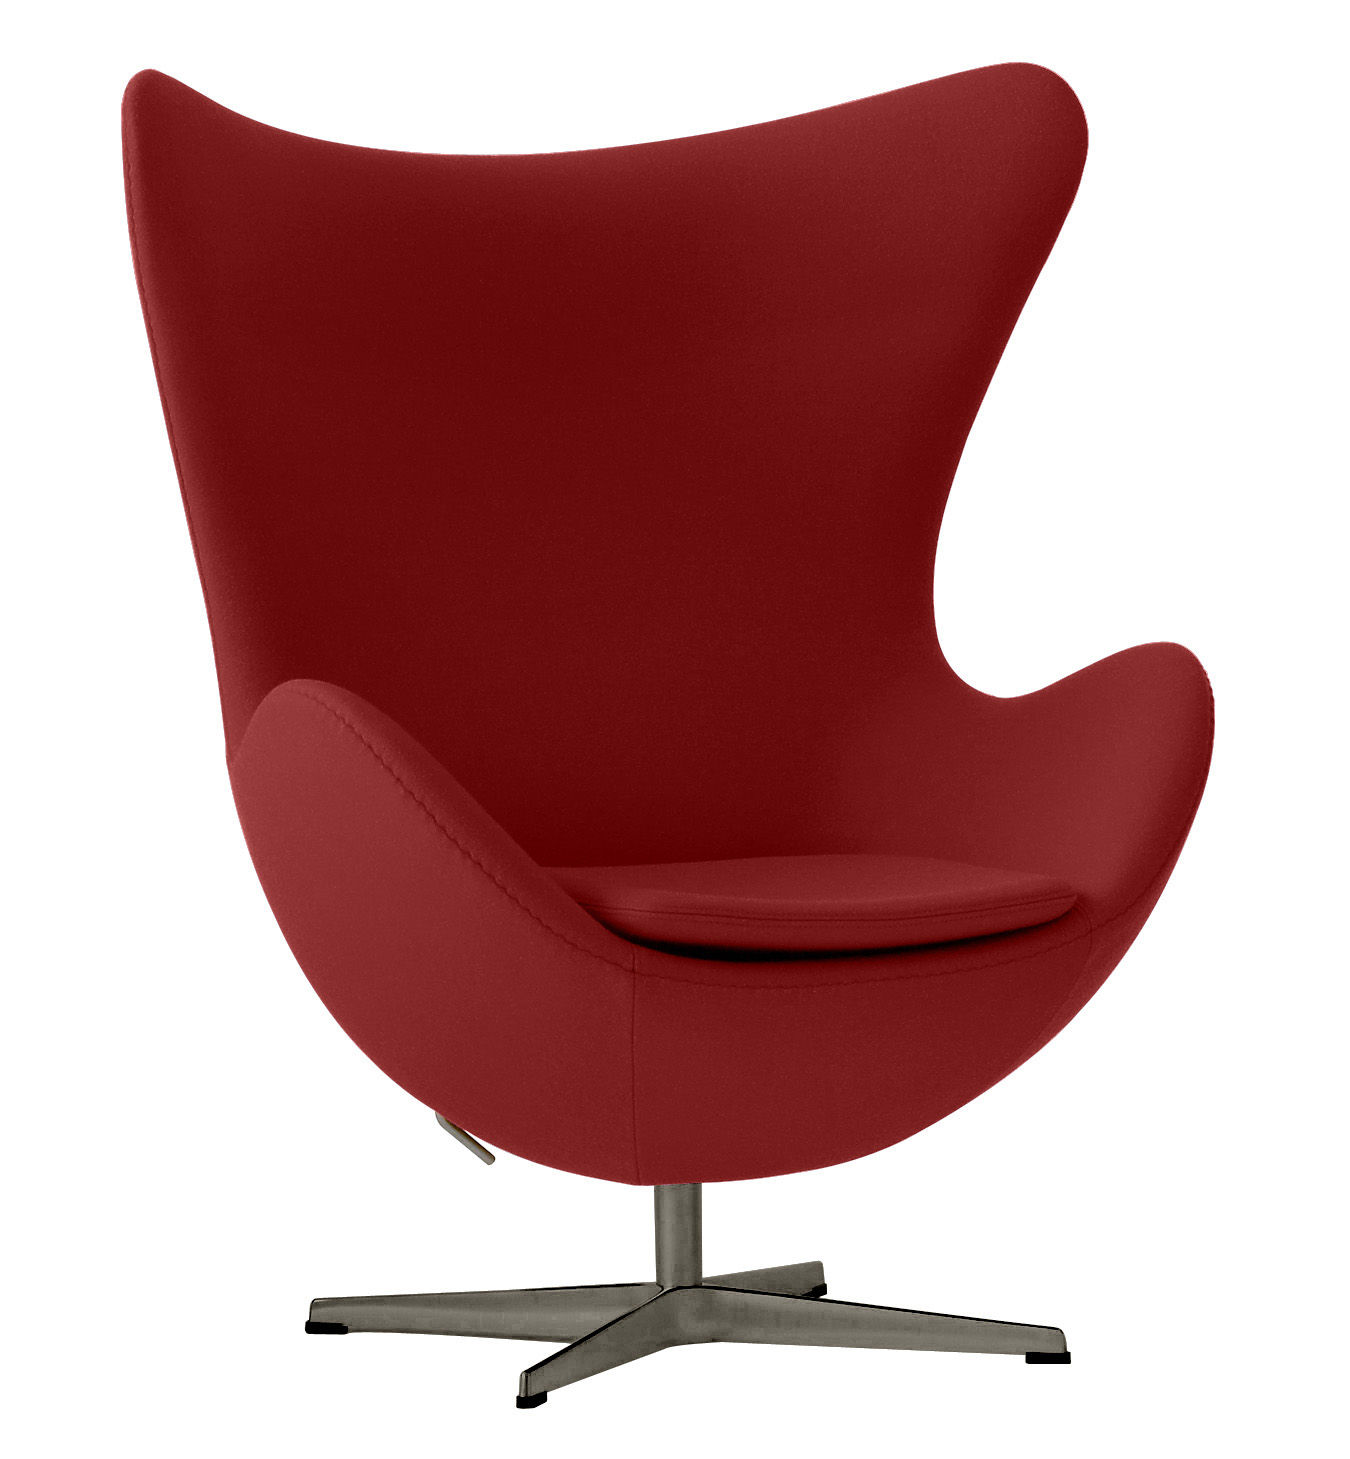 Möbel - Lounge Sessel - Egg chair Drehsessel Stoff - Fritz Hansen - Rot - Glasfaser, Kvadrat-Gewebe, poliertes Aluminium, Polyurethan-Schaum